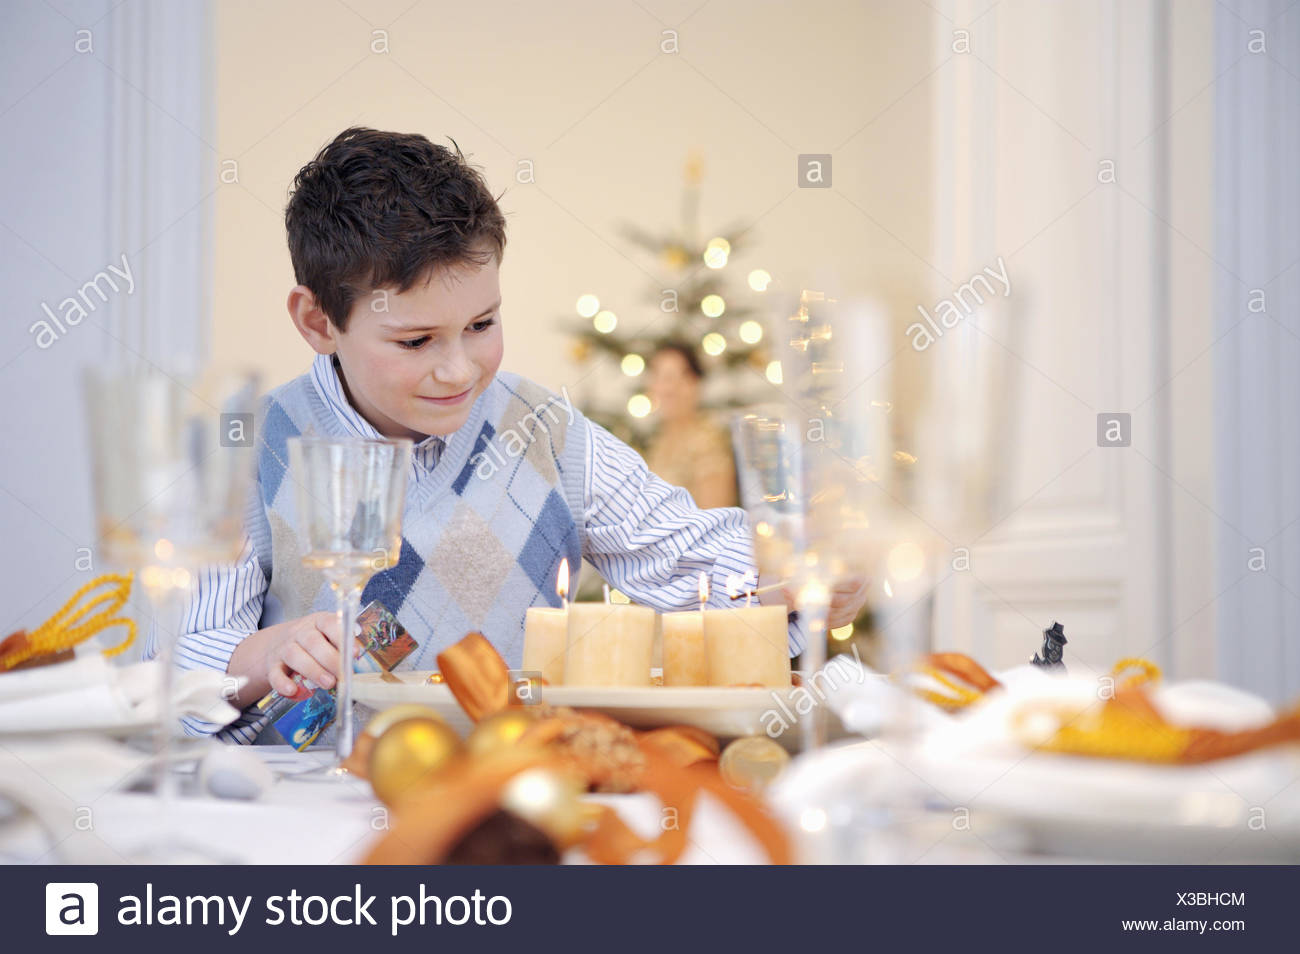 Boy helping set table at Christmastime - Stock Image